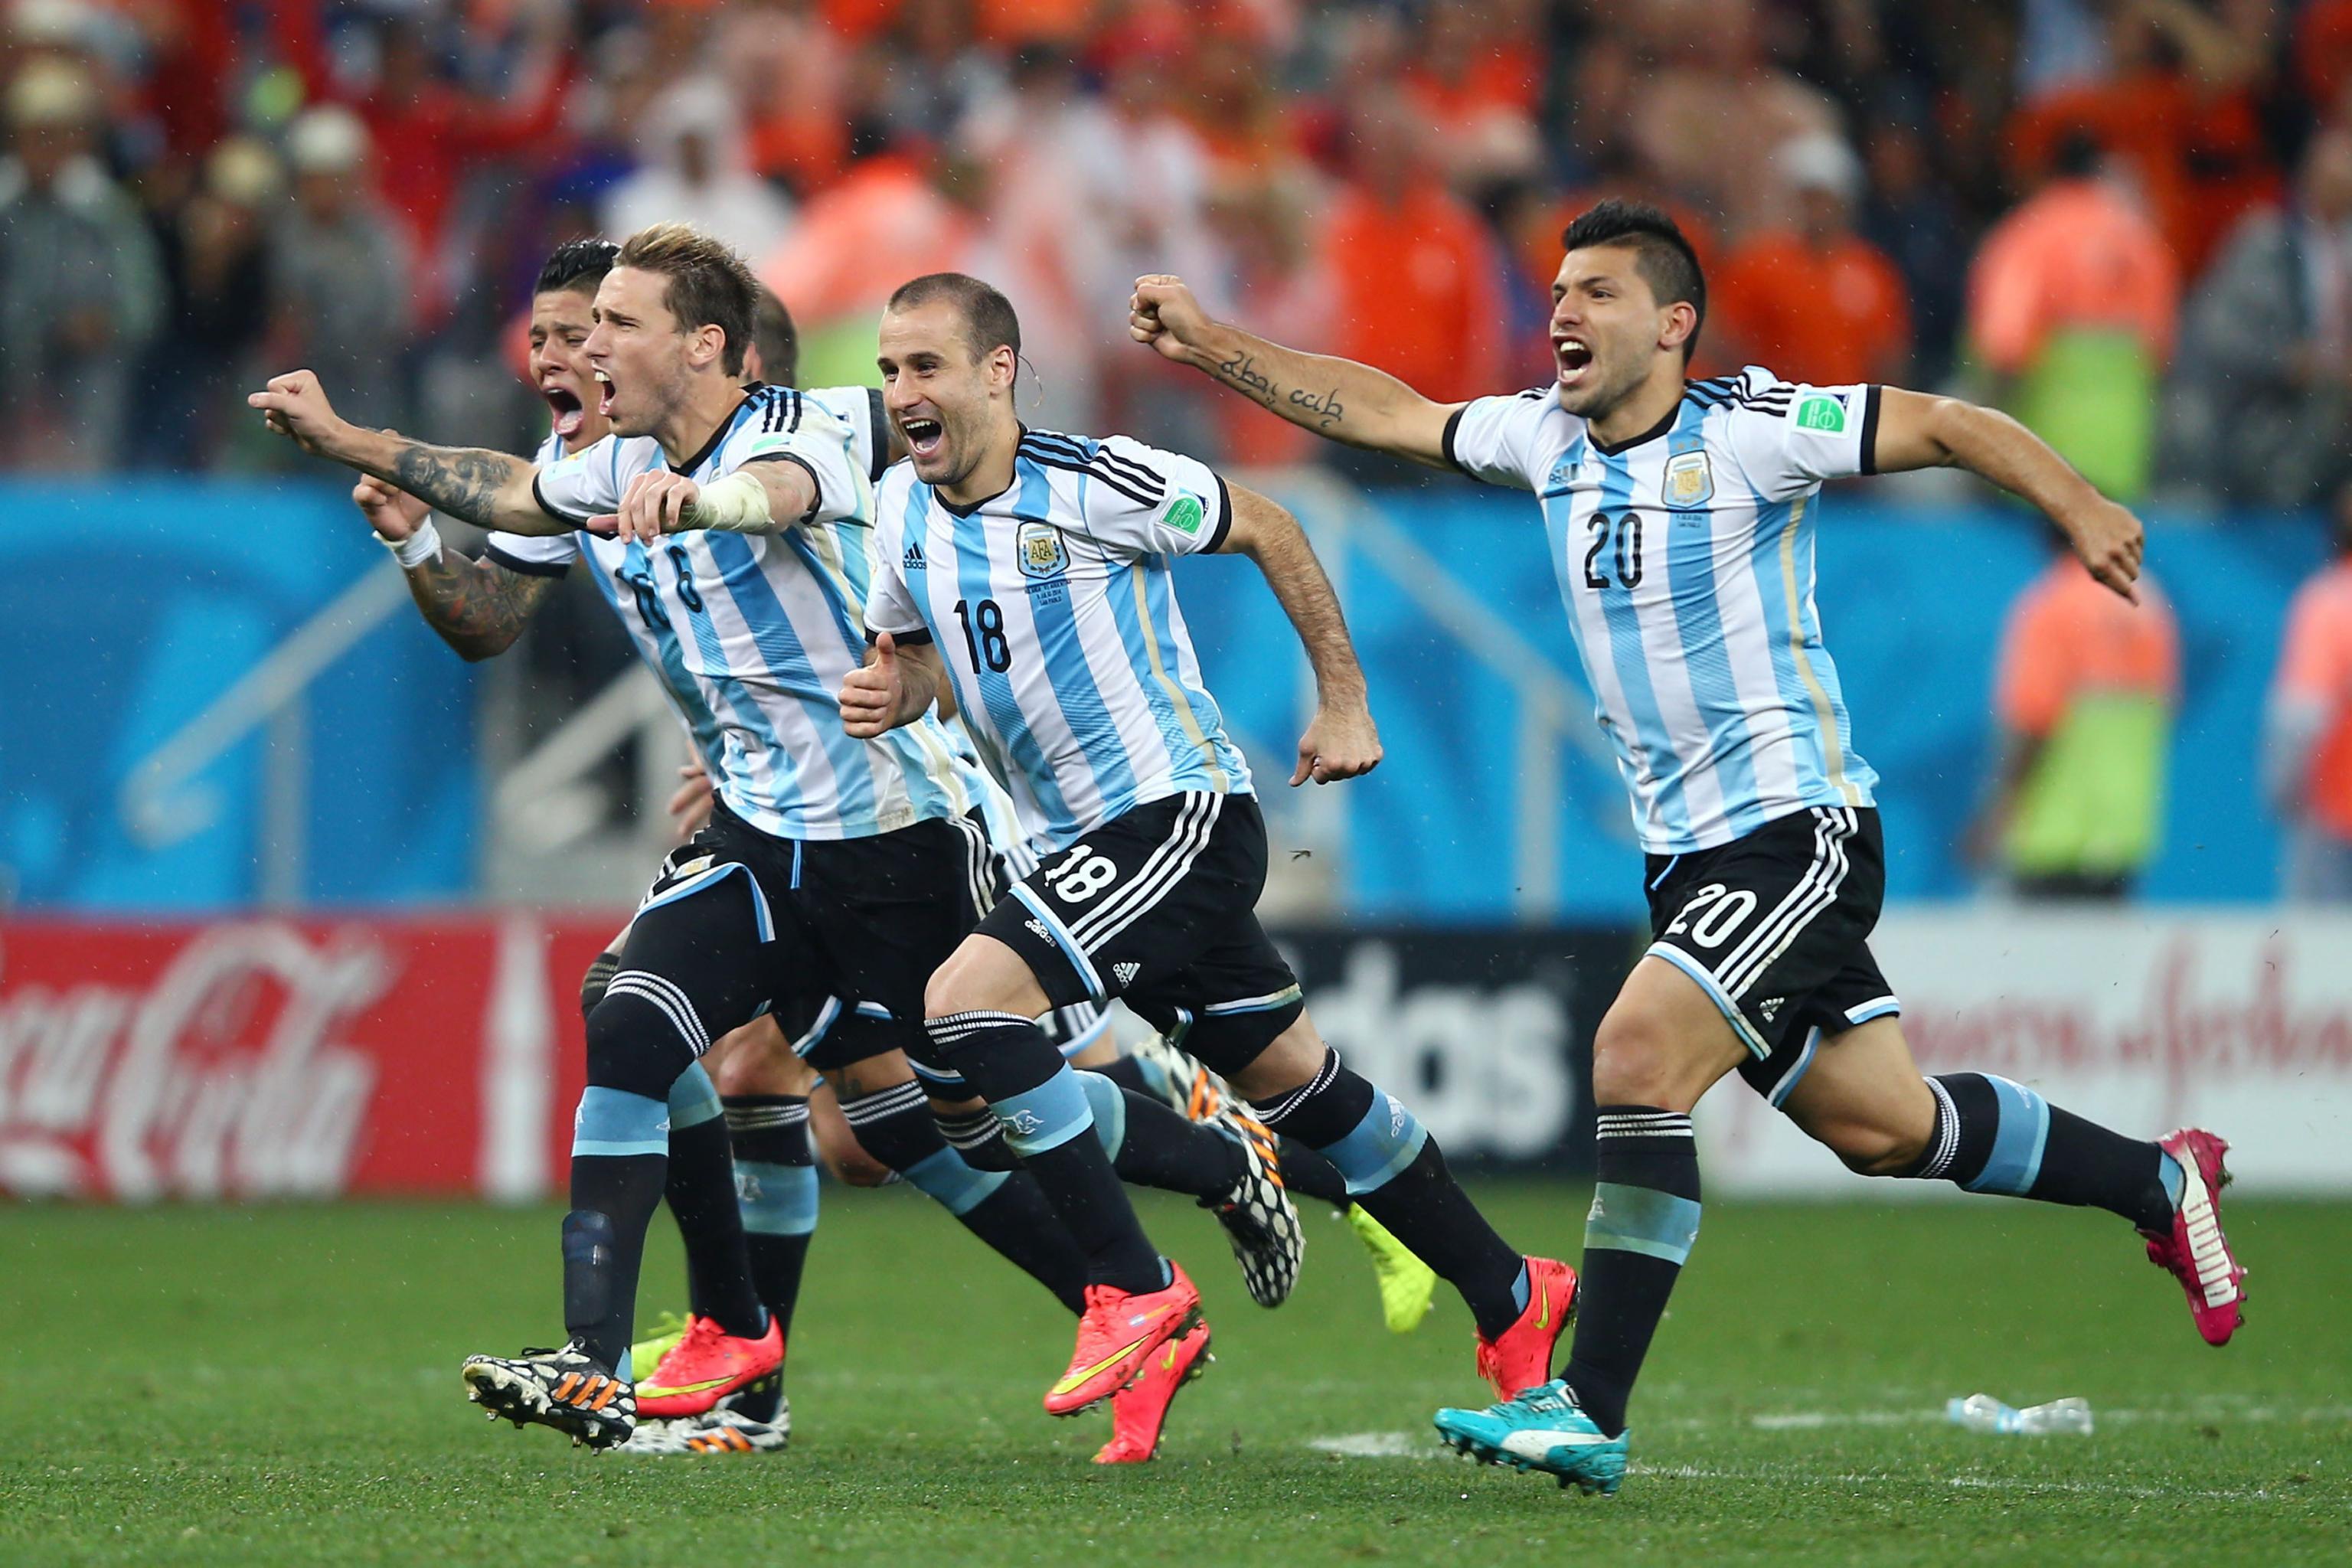 Germany Argentina 2014 Full Match